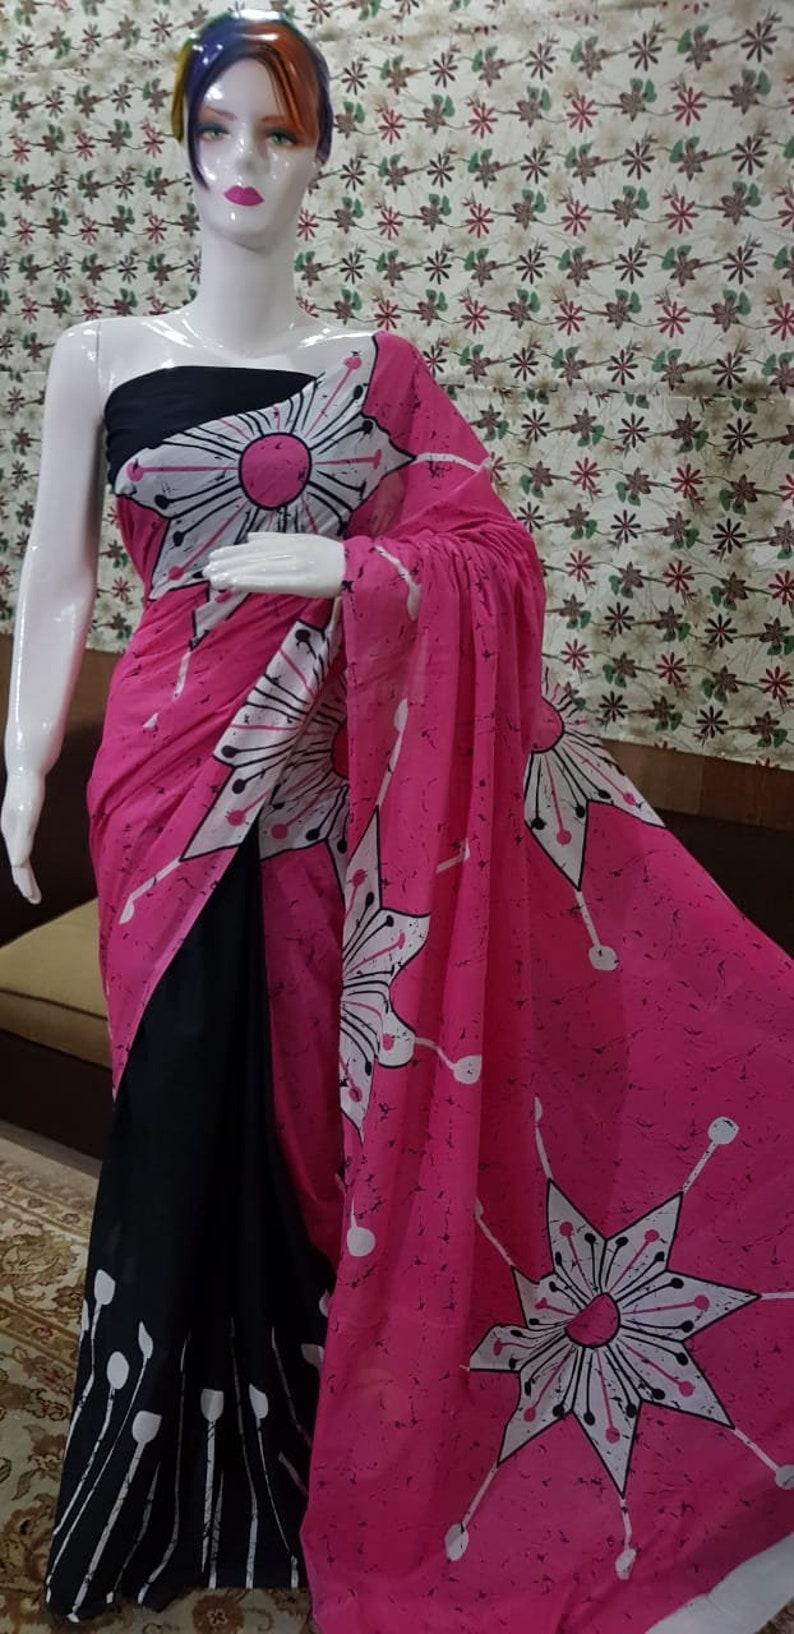 New Pure Cotton Handmade Sari Hastkala Printed Handblock Handmade Cotton Mulmul Saree Indian Clothing Dress Women Beautifull Woven Sari